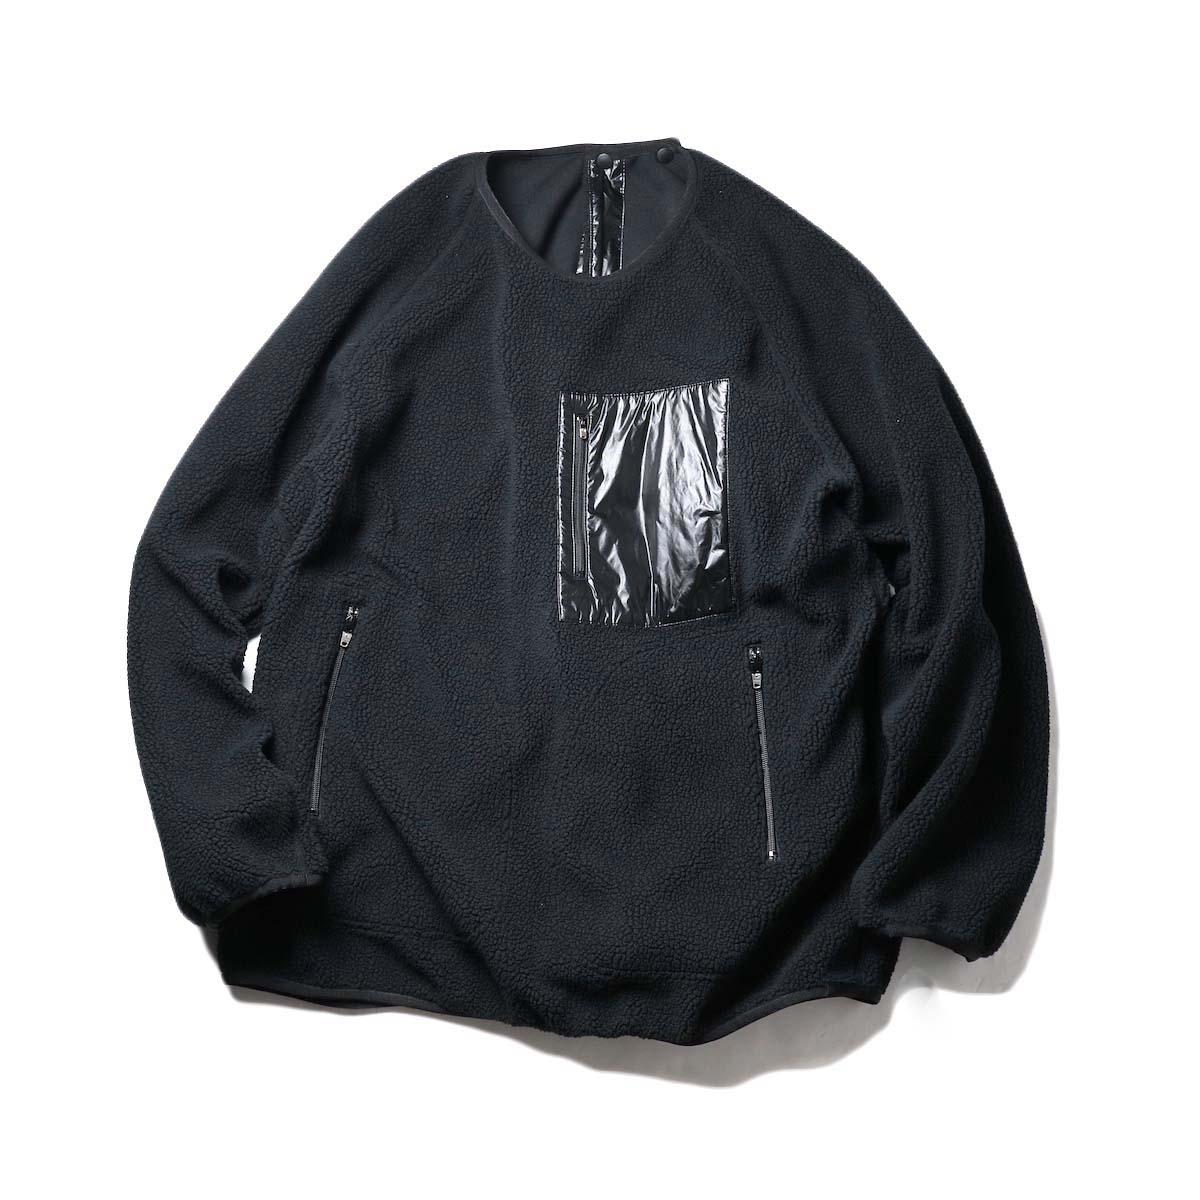 The Soloist / sc.0035AW20 regulator medical jacket